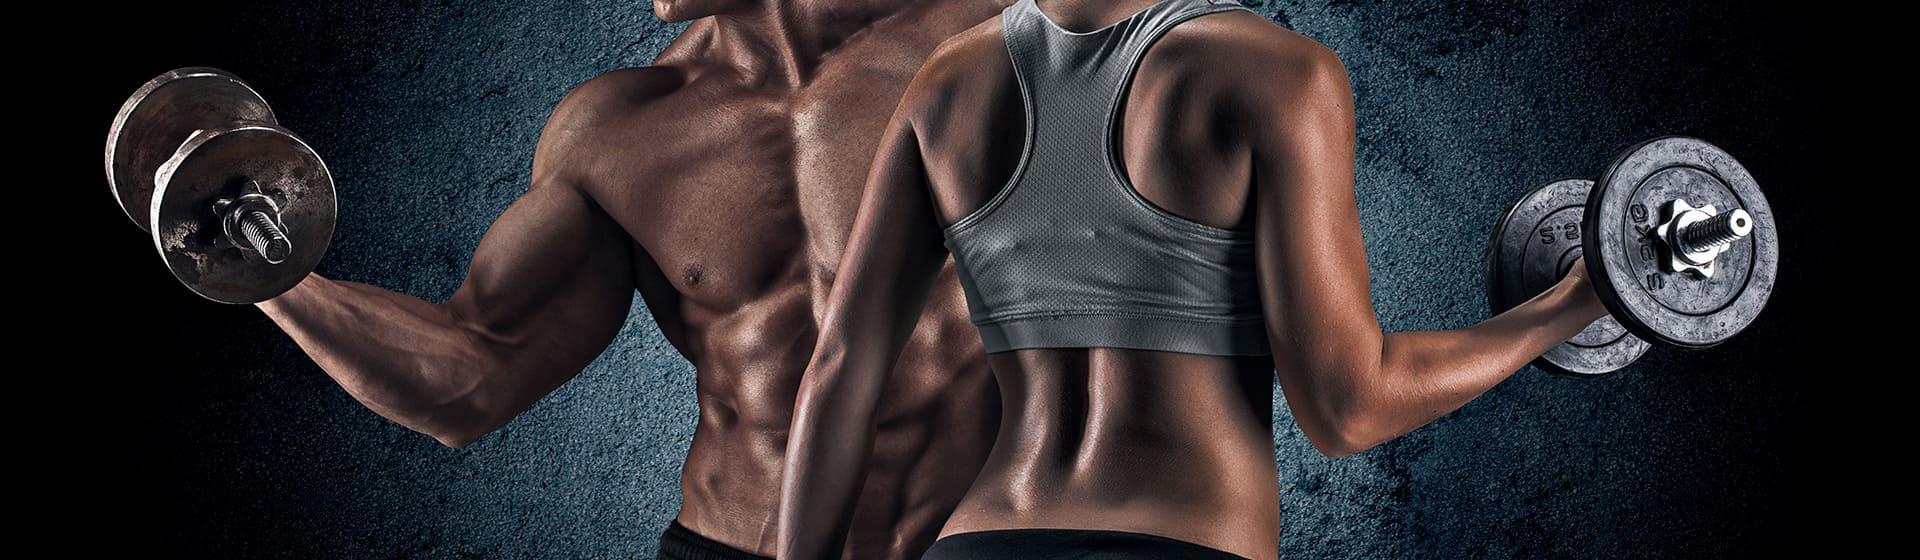 Фитнес - Женские толстовки